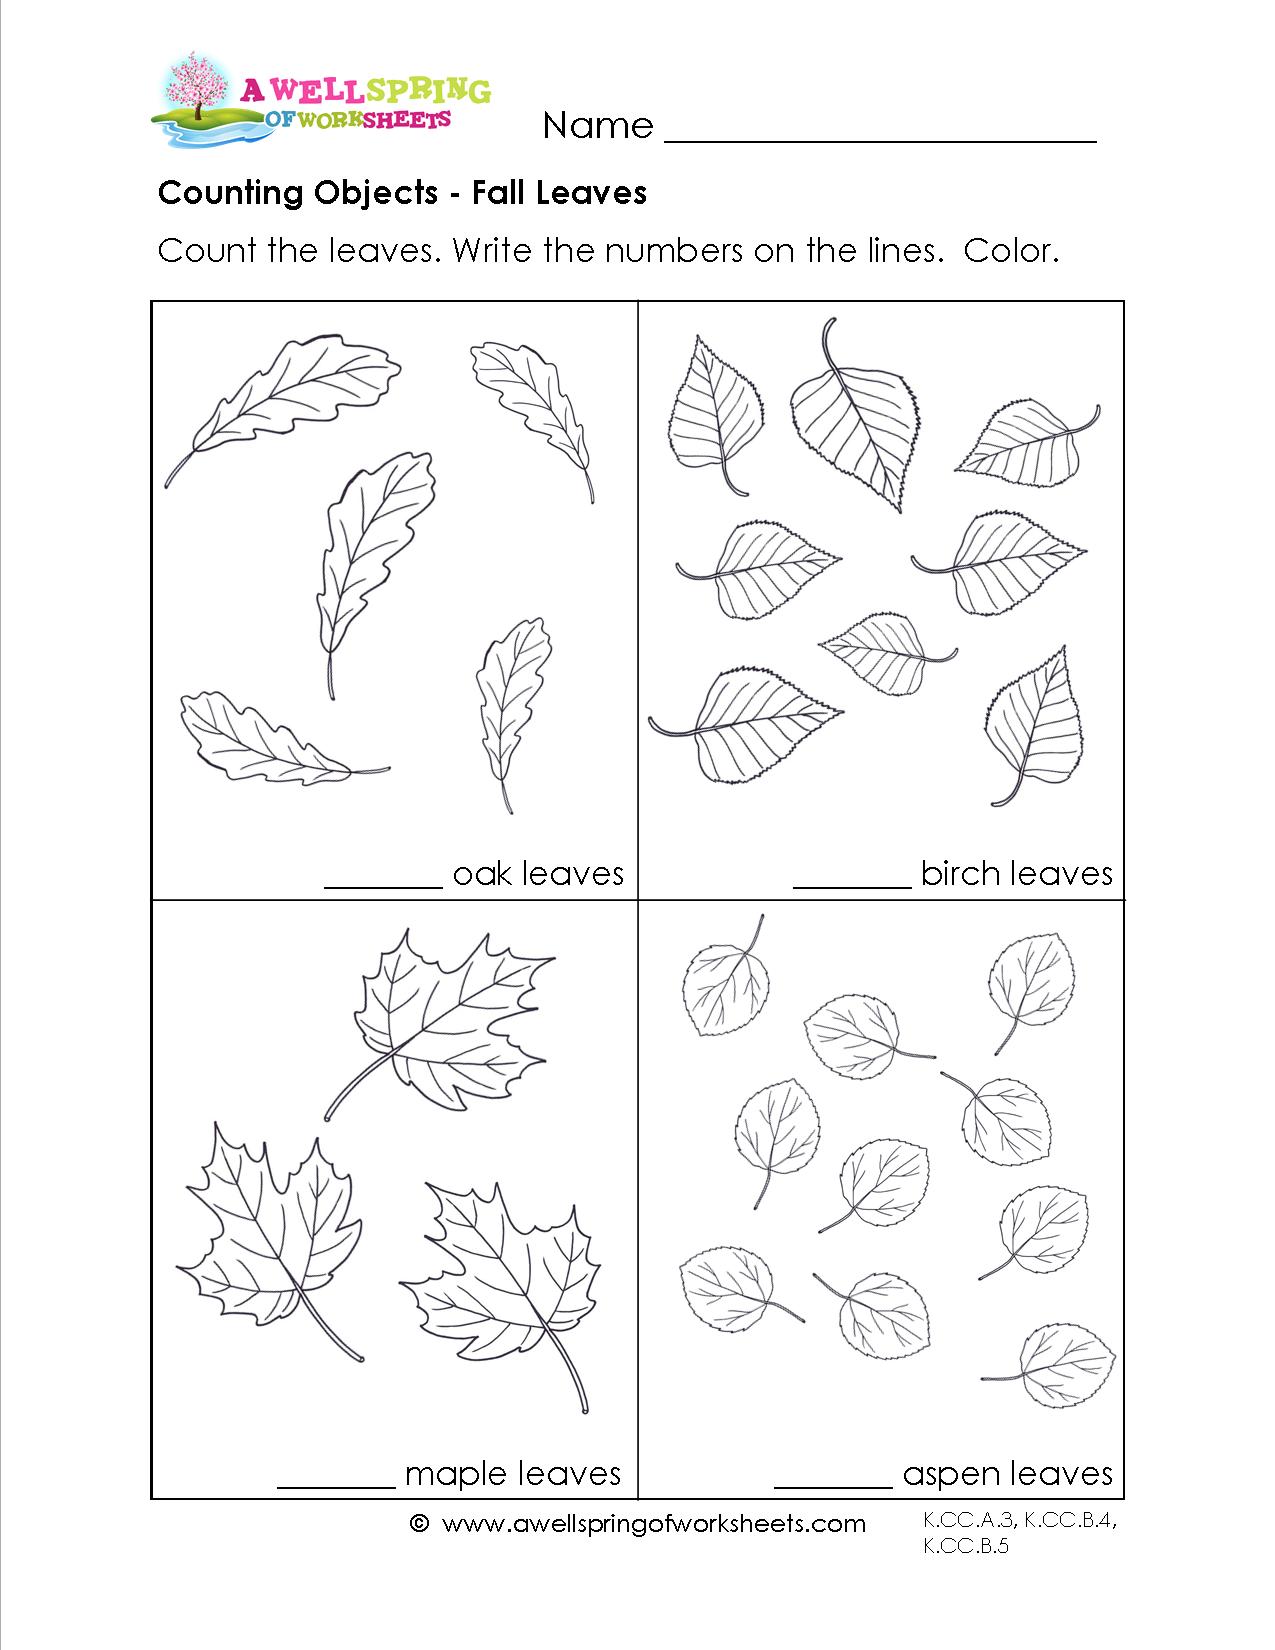 Grade Level Worksheets A Wellspring Of Worksheets Creative Worksheets Worksheets Learn To Count [ 1650 x 1275 Pixel ]